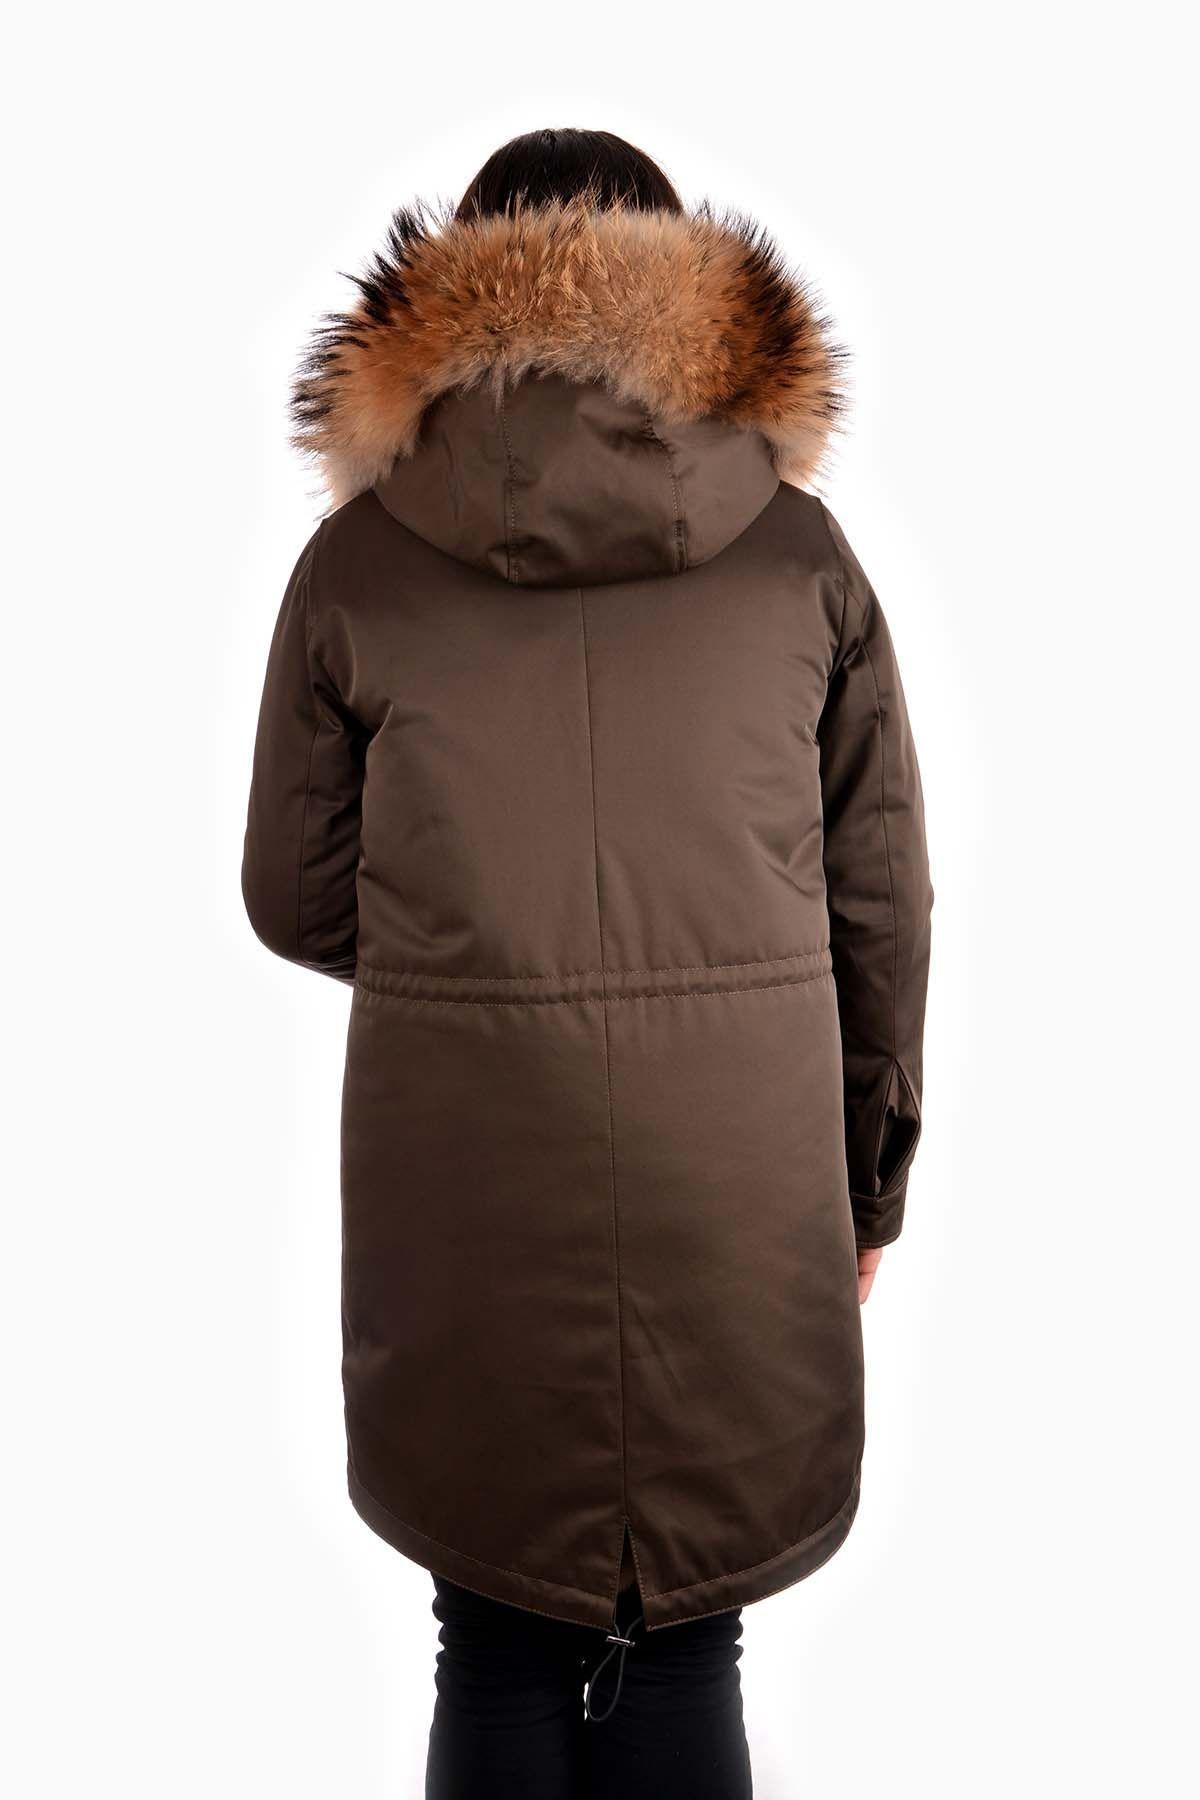 Pegia Women Jacket From Genuine Fur With Detachable Vest Beige